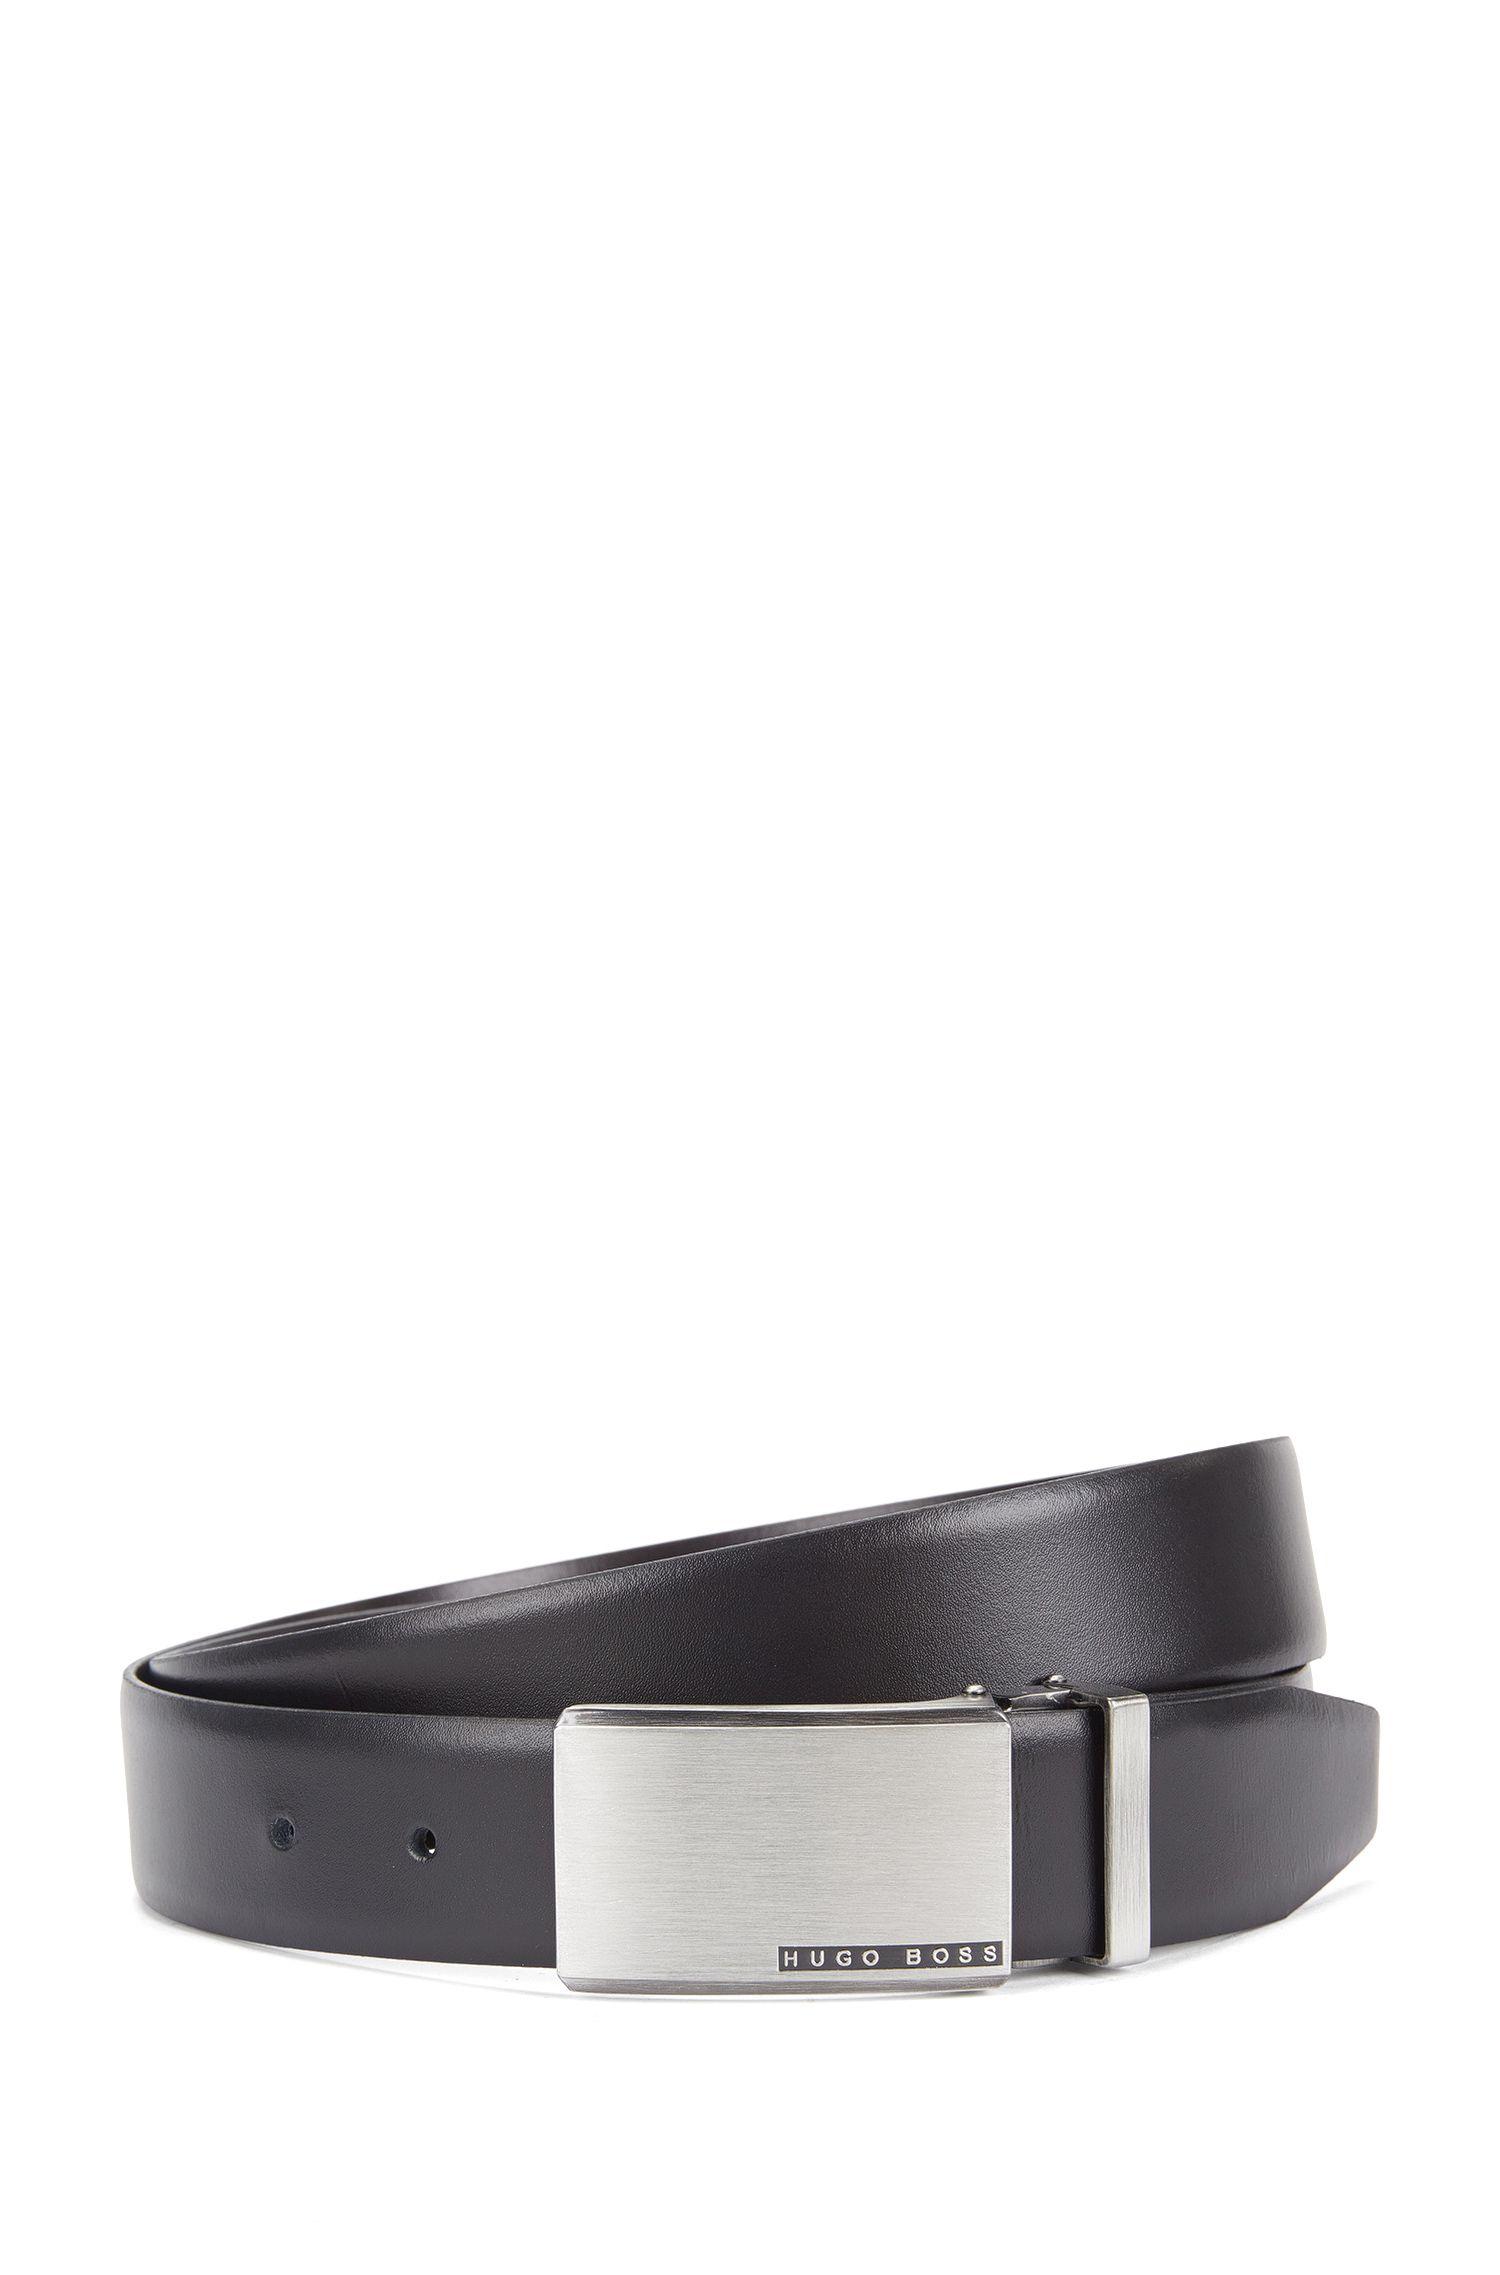 Wendegürtel aus Leder mit Koppelschnalle: 'Odell_Or35_pp'